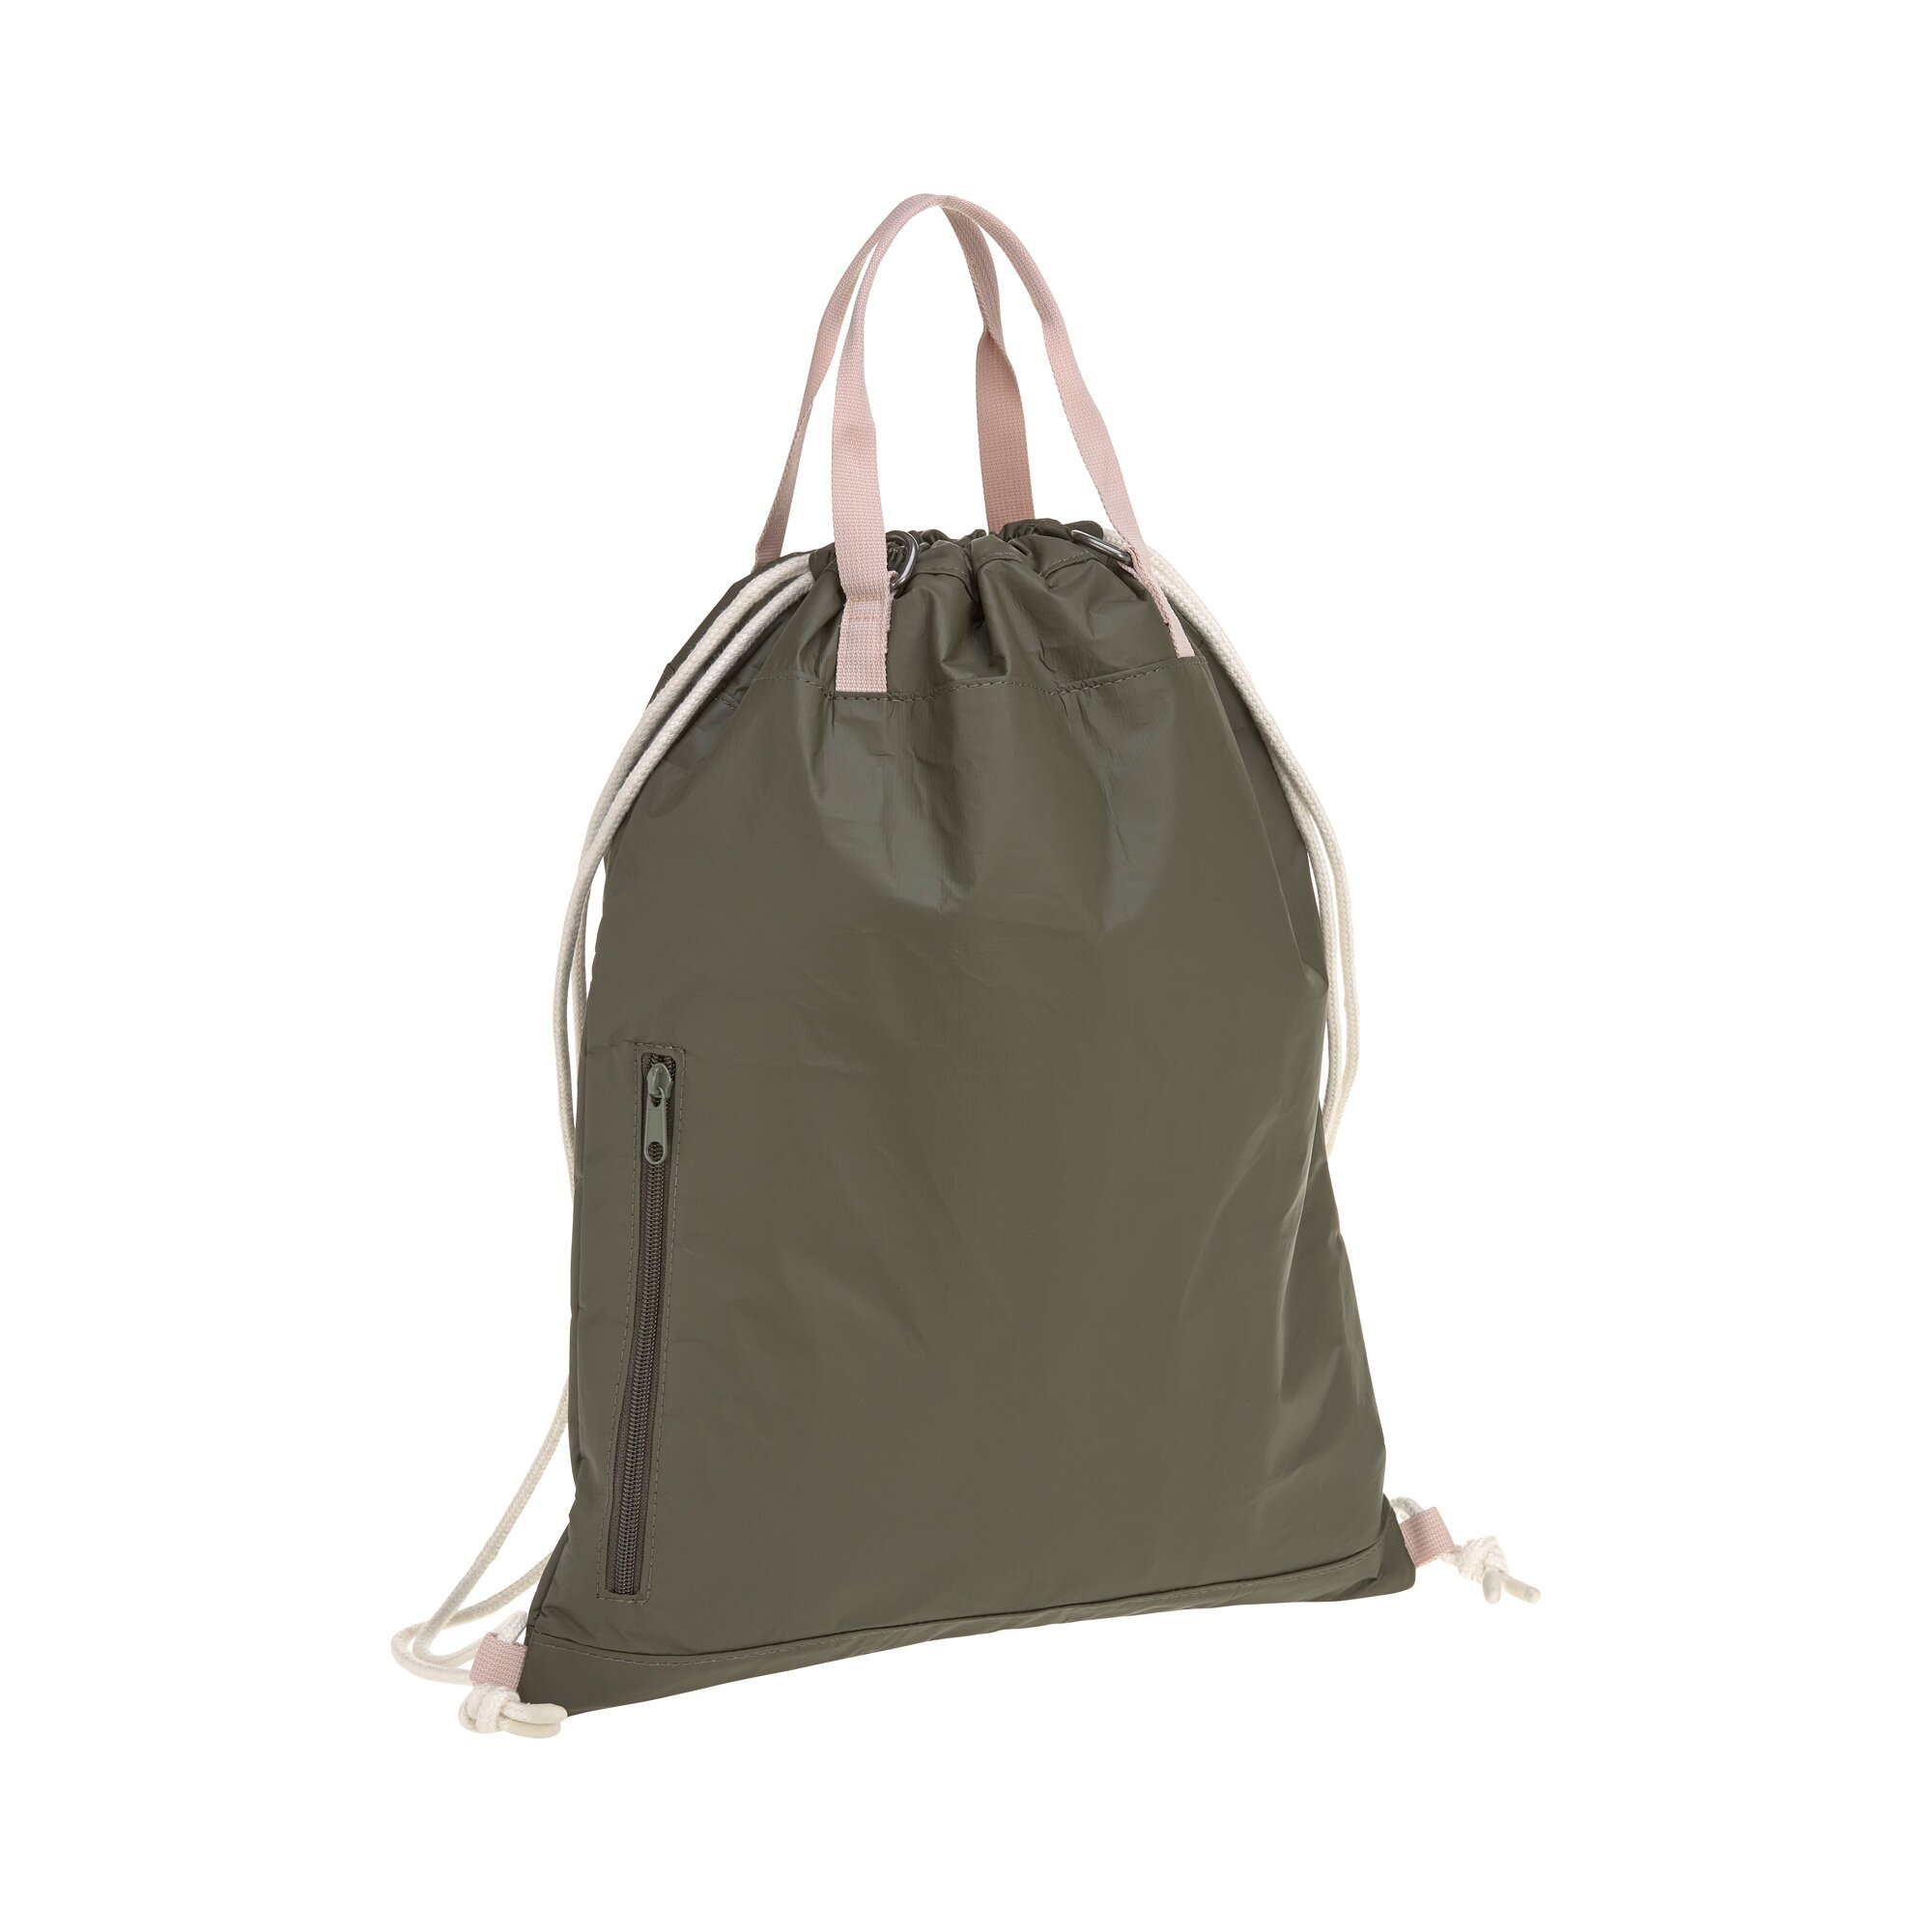 green-label-wickelrucksack-tyve-string-bag-khaki